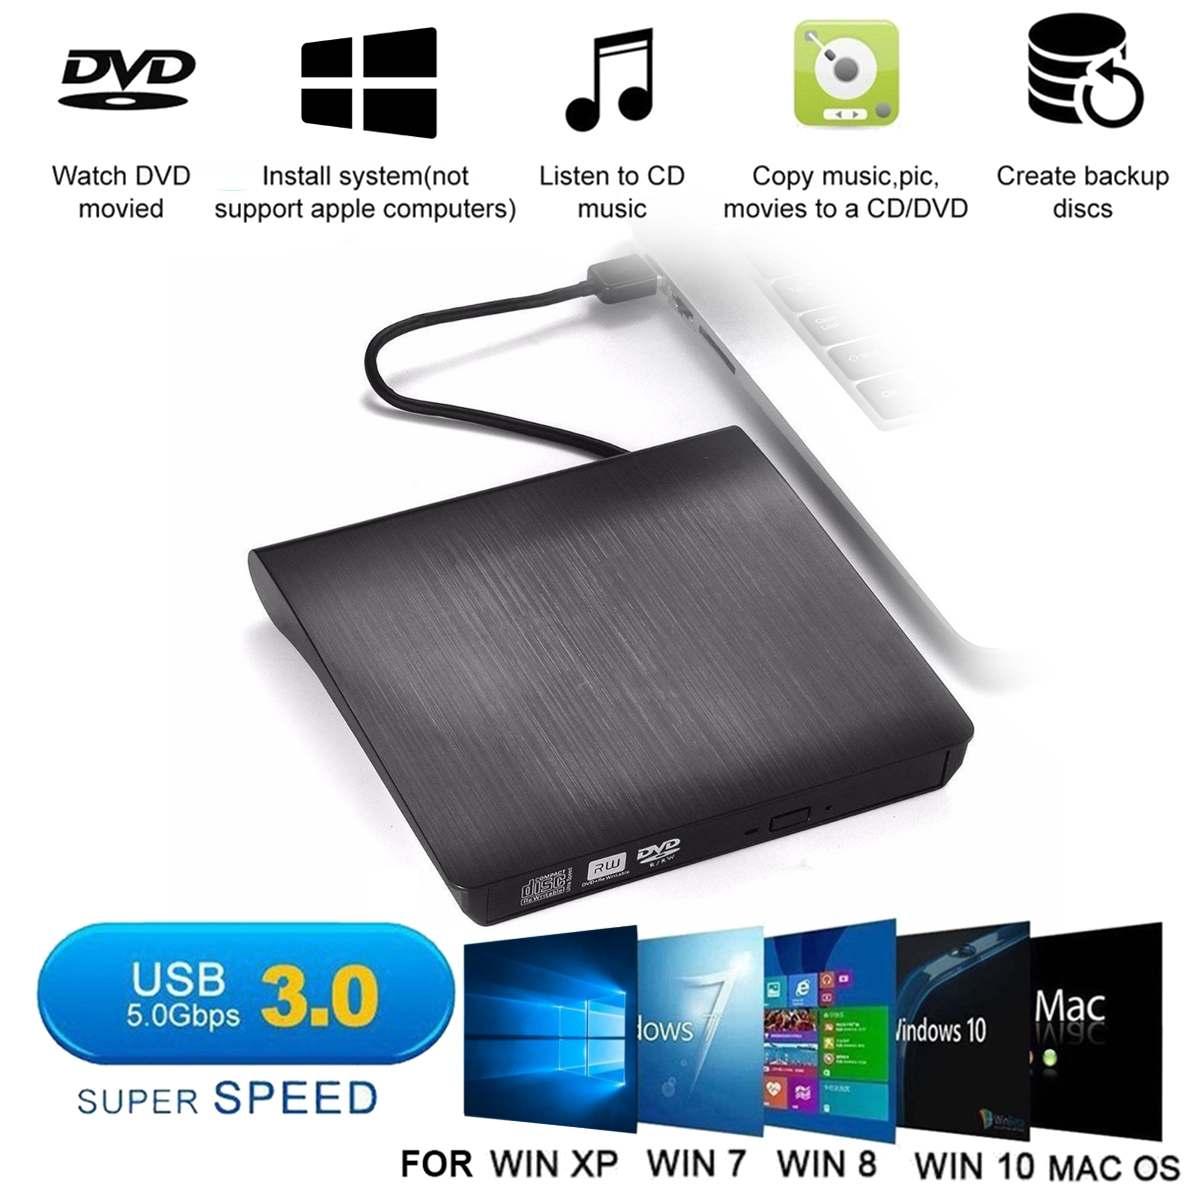 S SKYEE USB 3.0 Slim externe DVD RW CD graveur lecteur lecteur lecteur lecteurs optiques pour PC portable